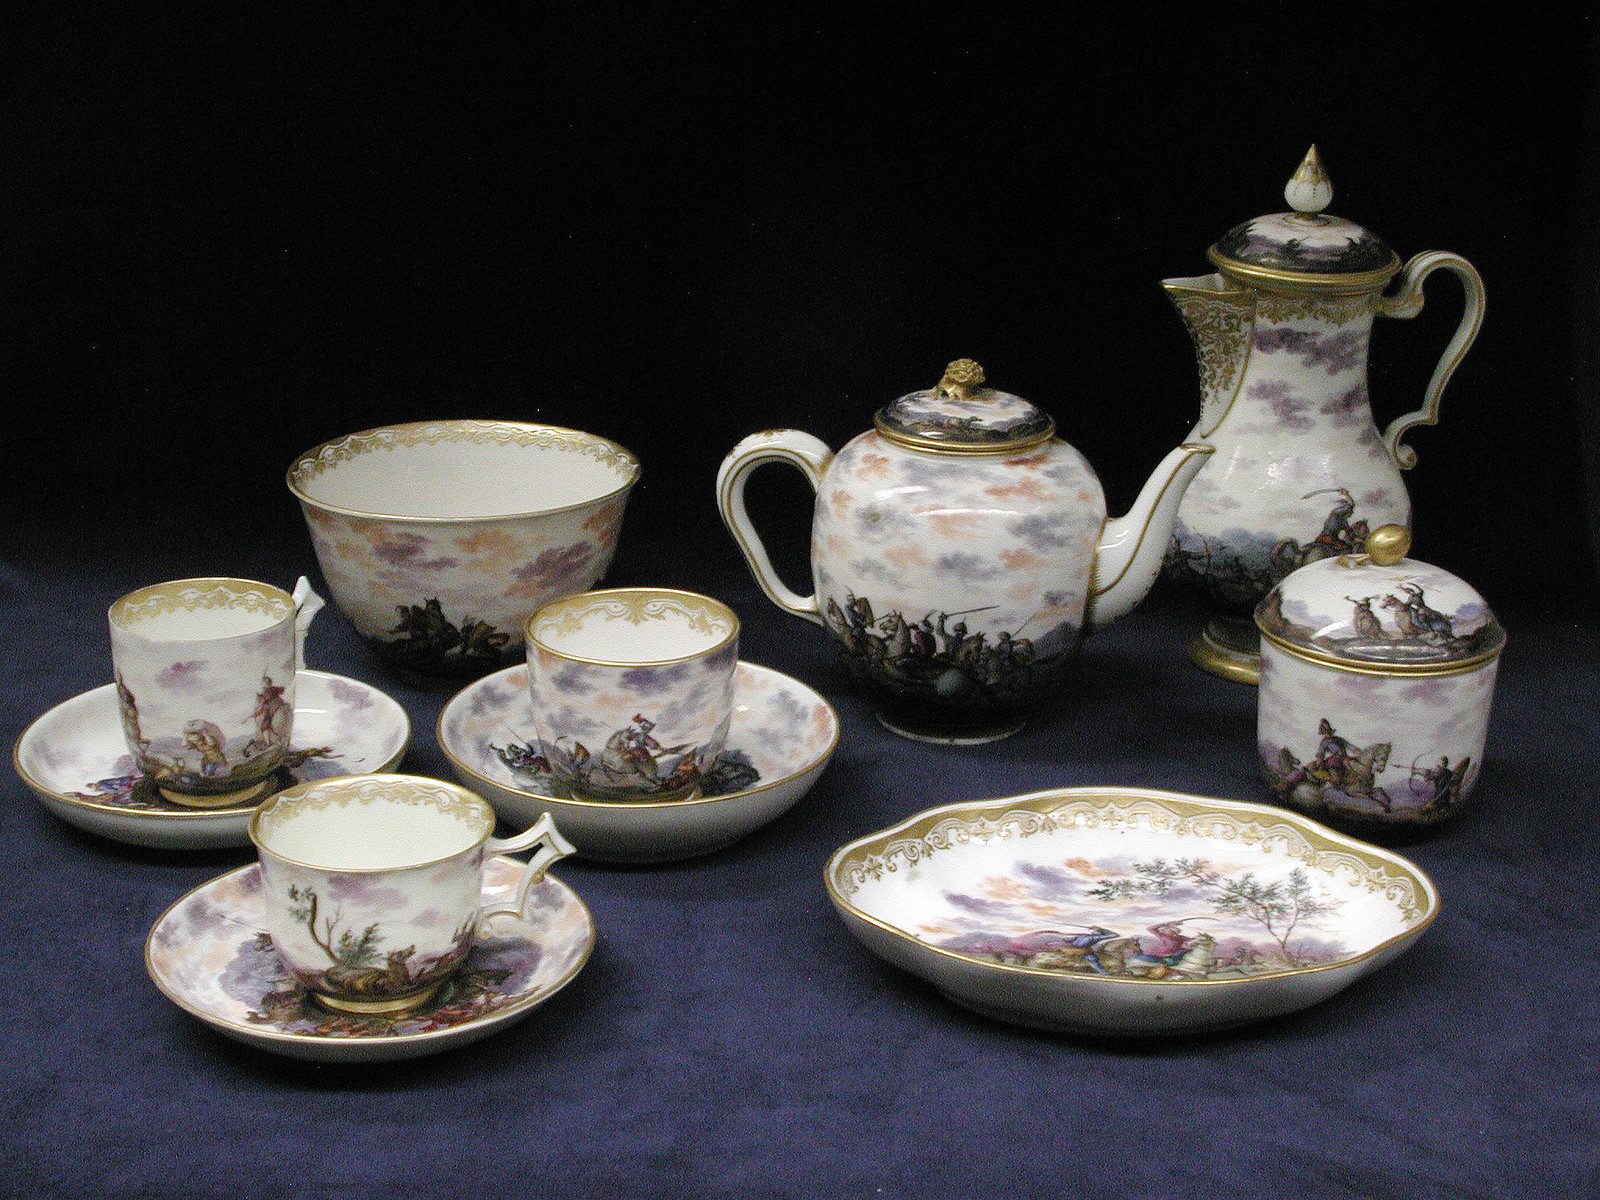 1743. Tea Service. Italian. Porcelain. metmuseum